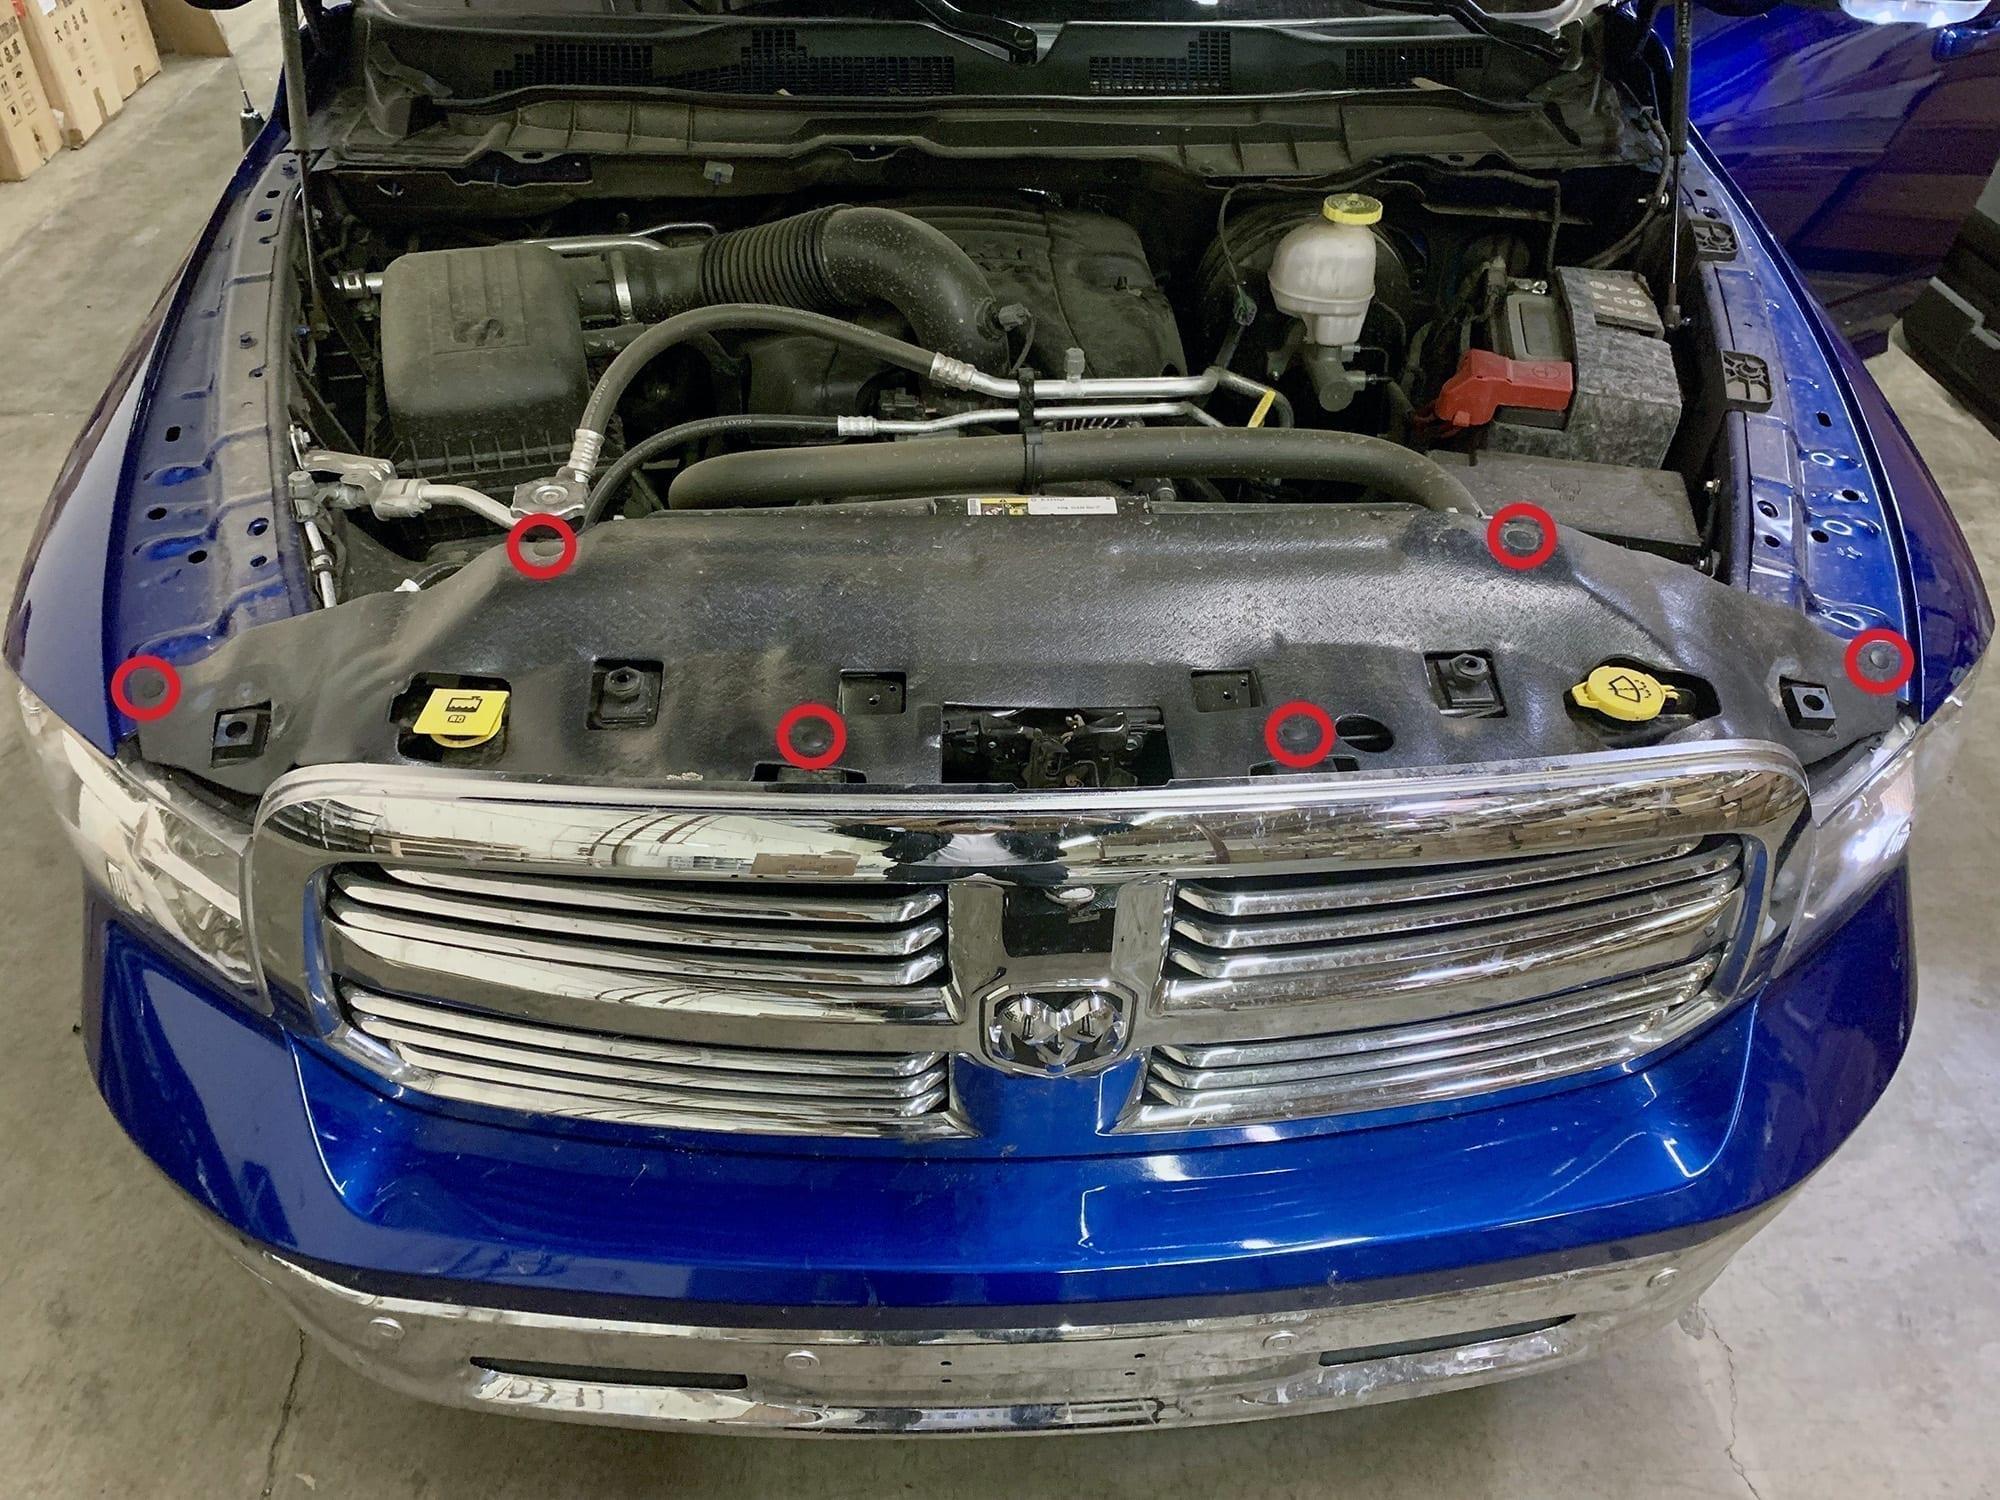 2014 Dodge Ram Headlight Wiring Diagram from aws.alpharexusa.com